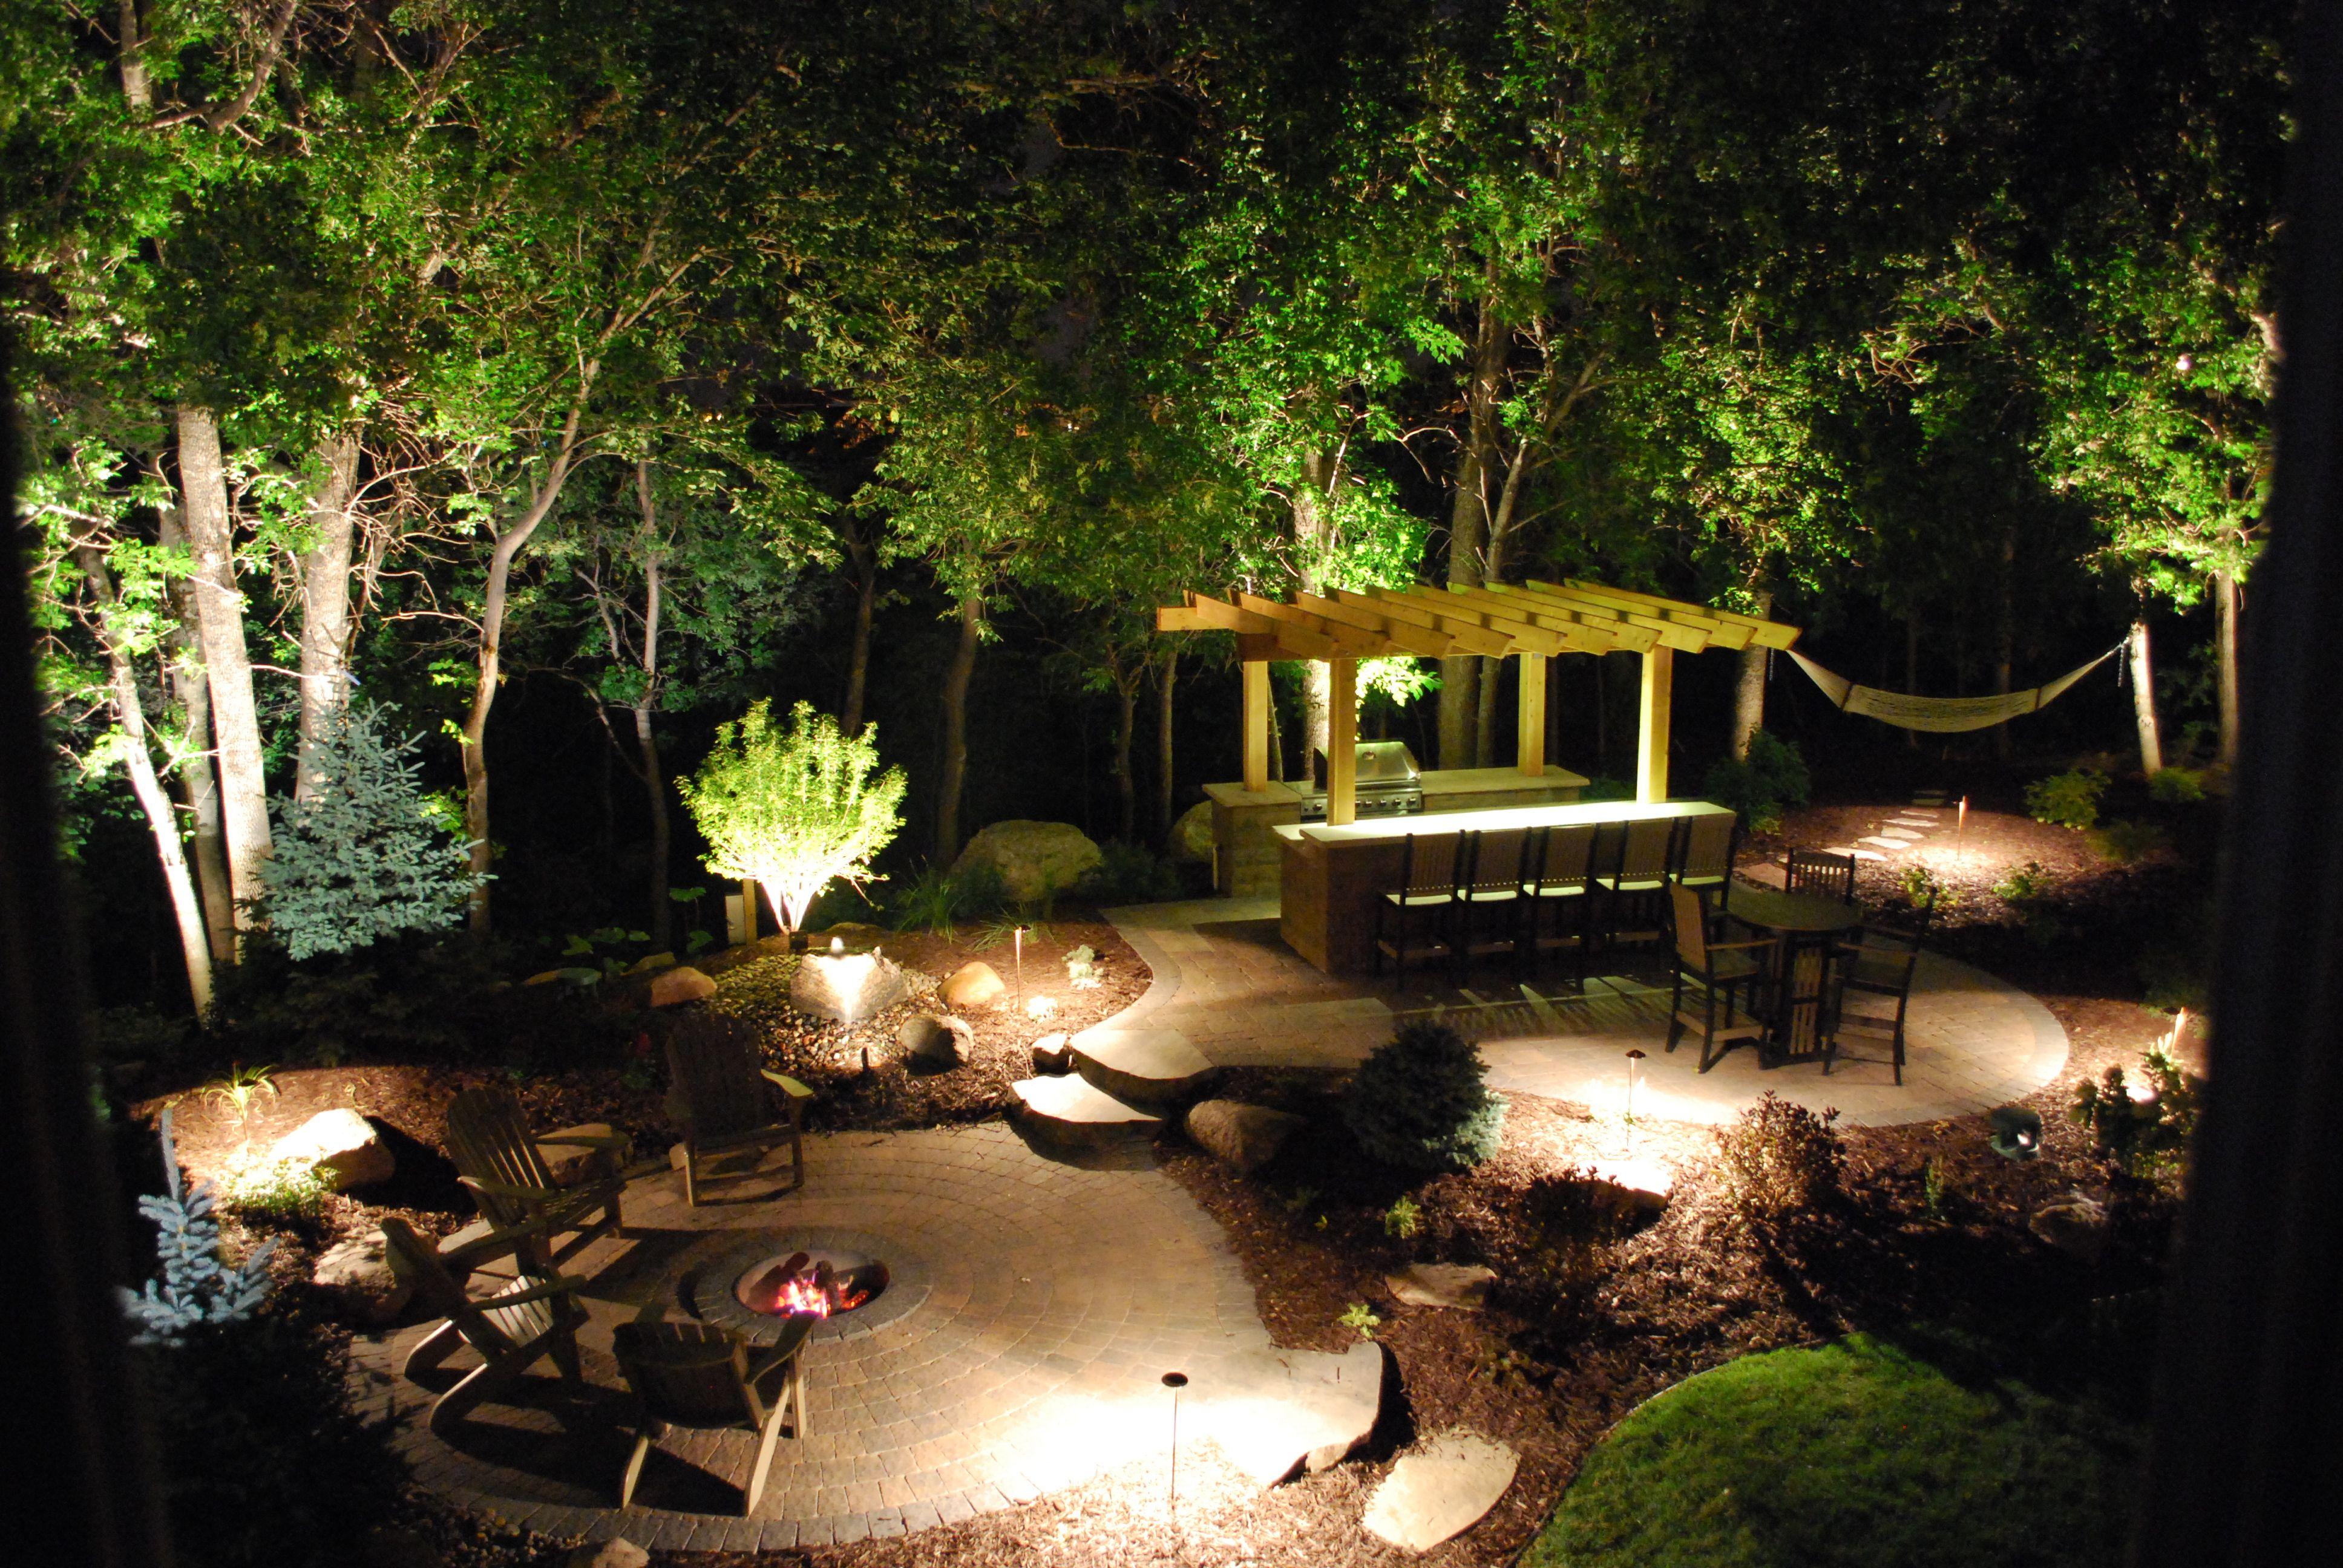 Related image Lawn Garden Pinterest